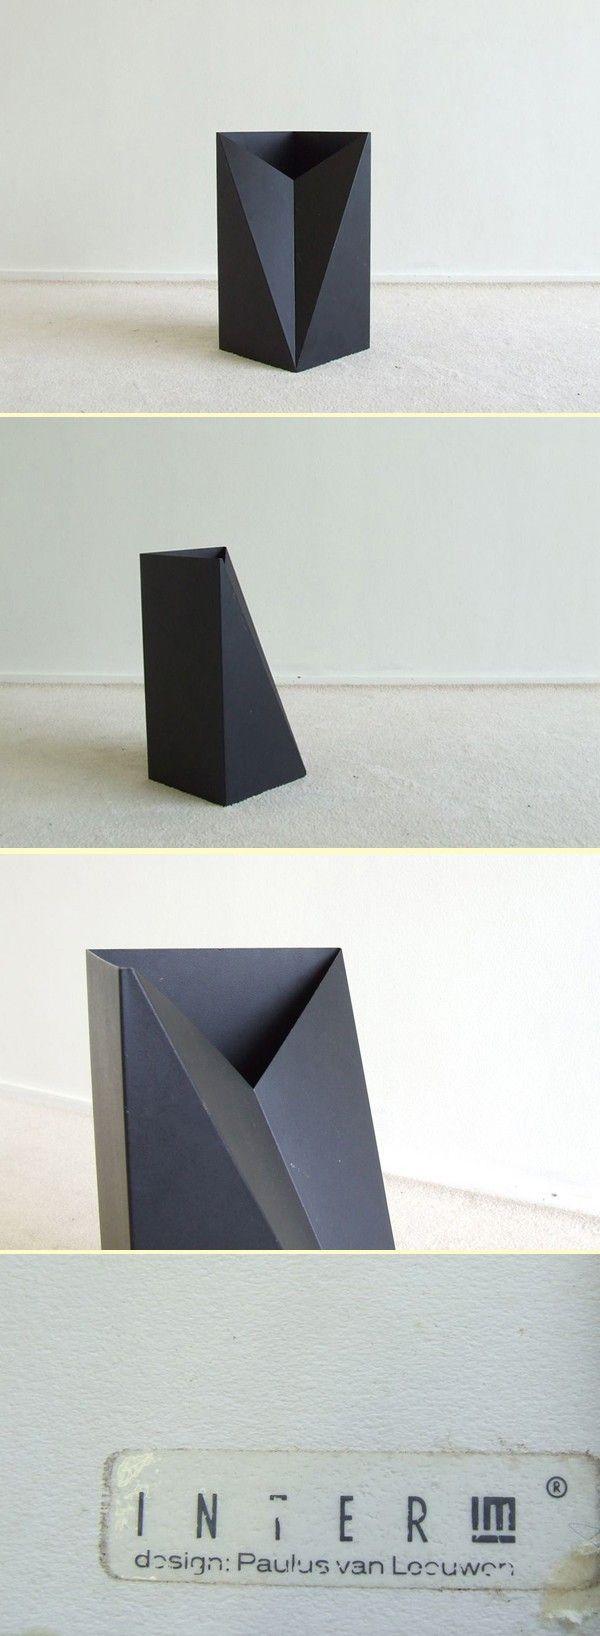 Dutch design garbage can / umbrella stand (5095)